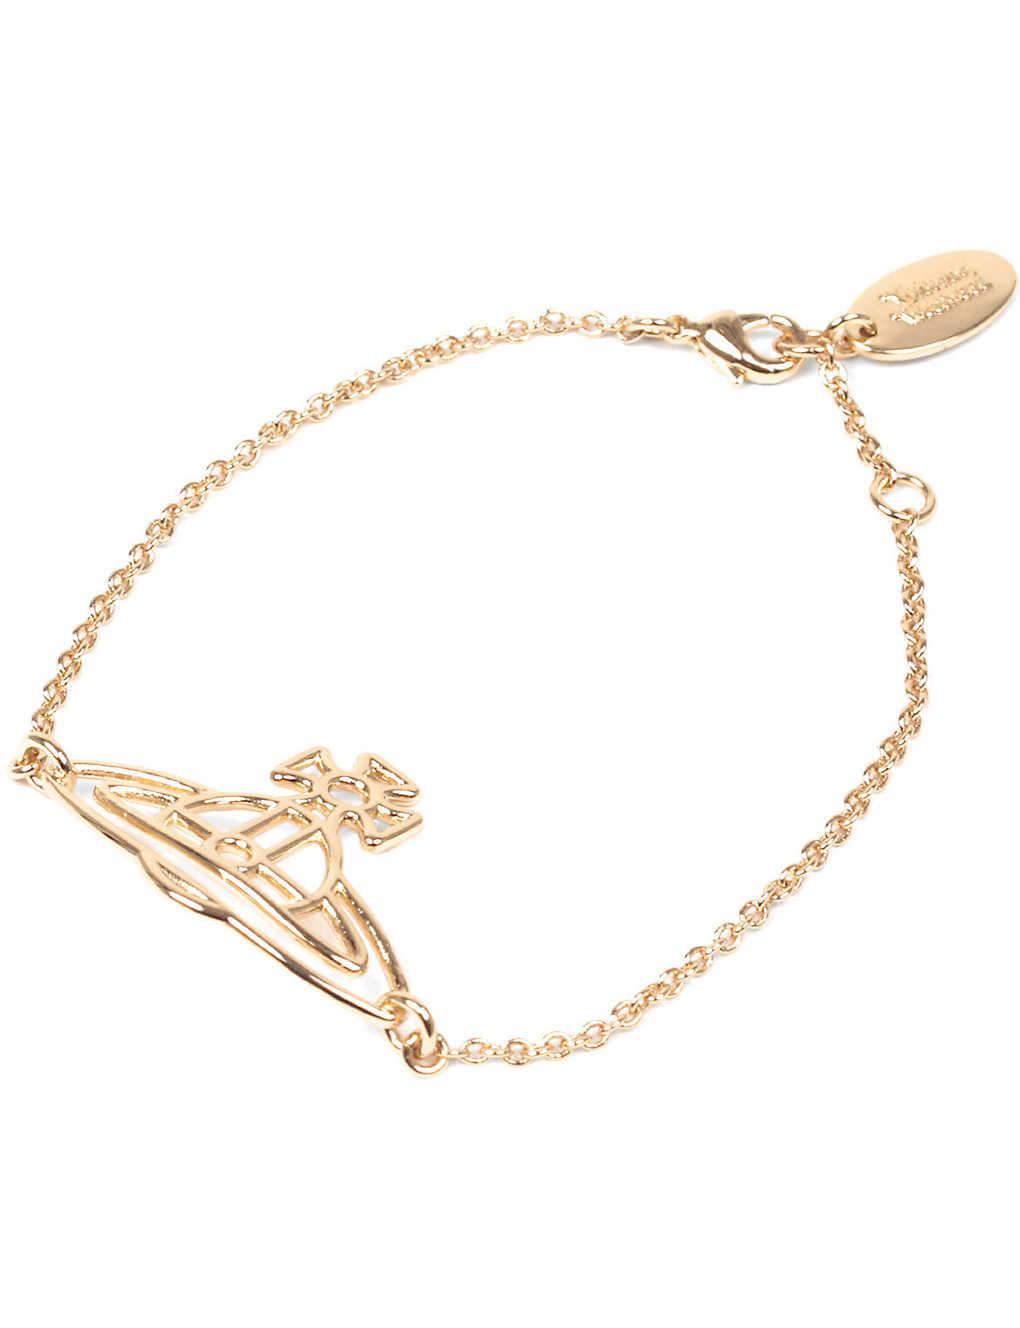 4b3187b4d0e1b2 VIVIENNE WESTWOOD JEWELLERY - Thin lines flat orb bracelet ...